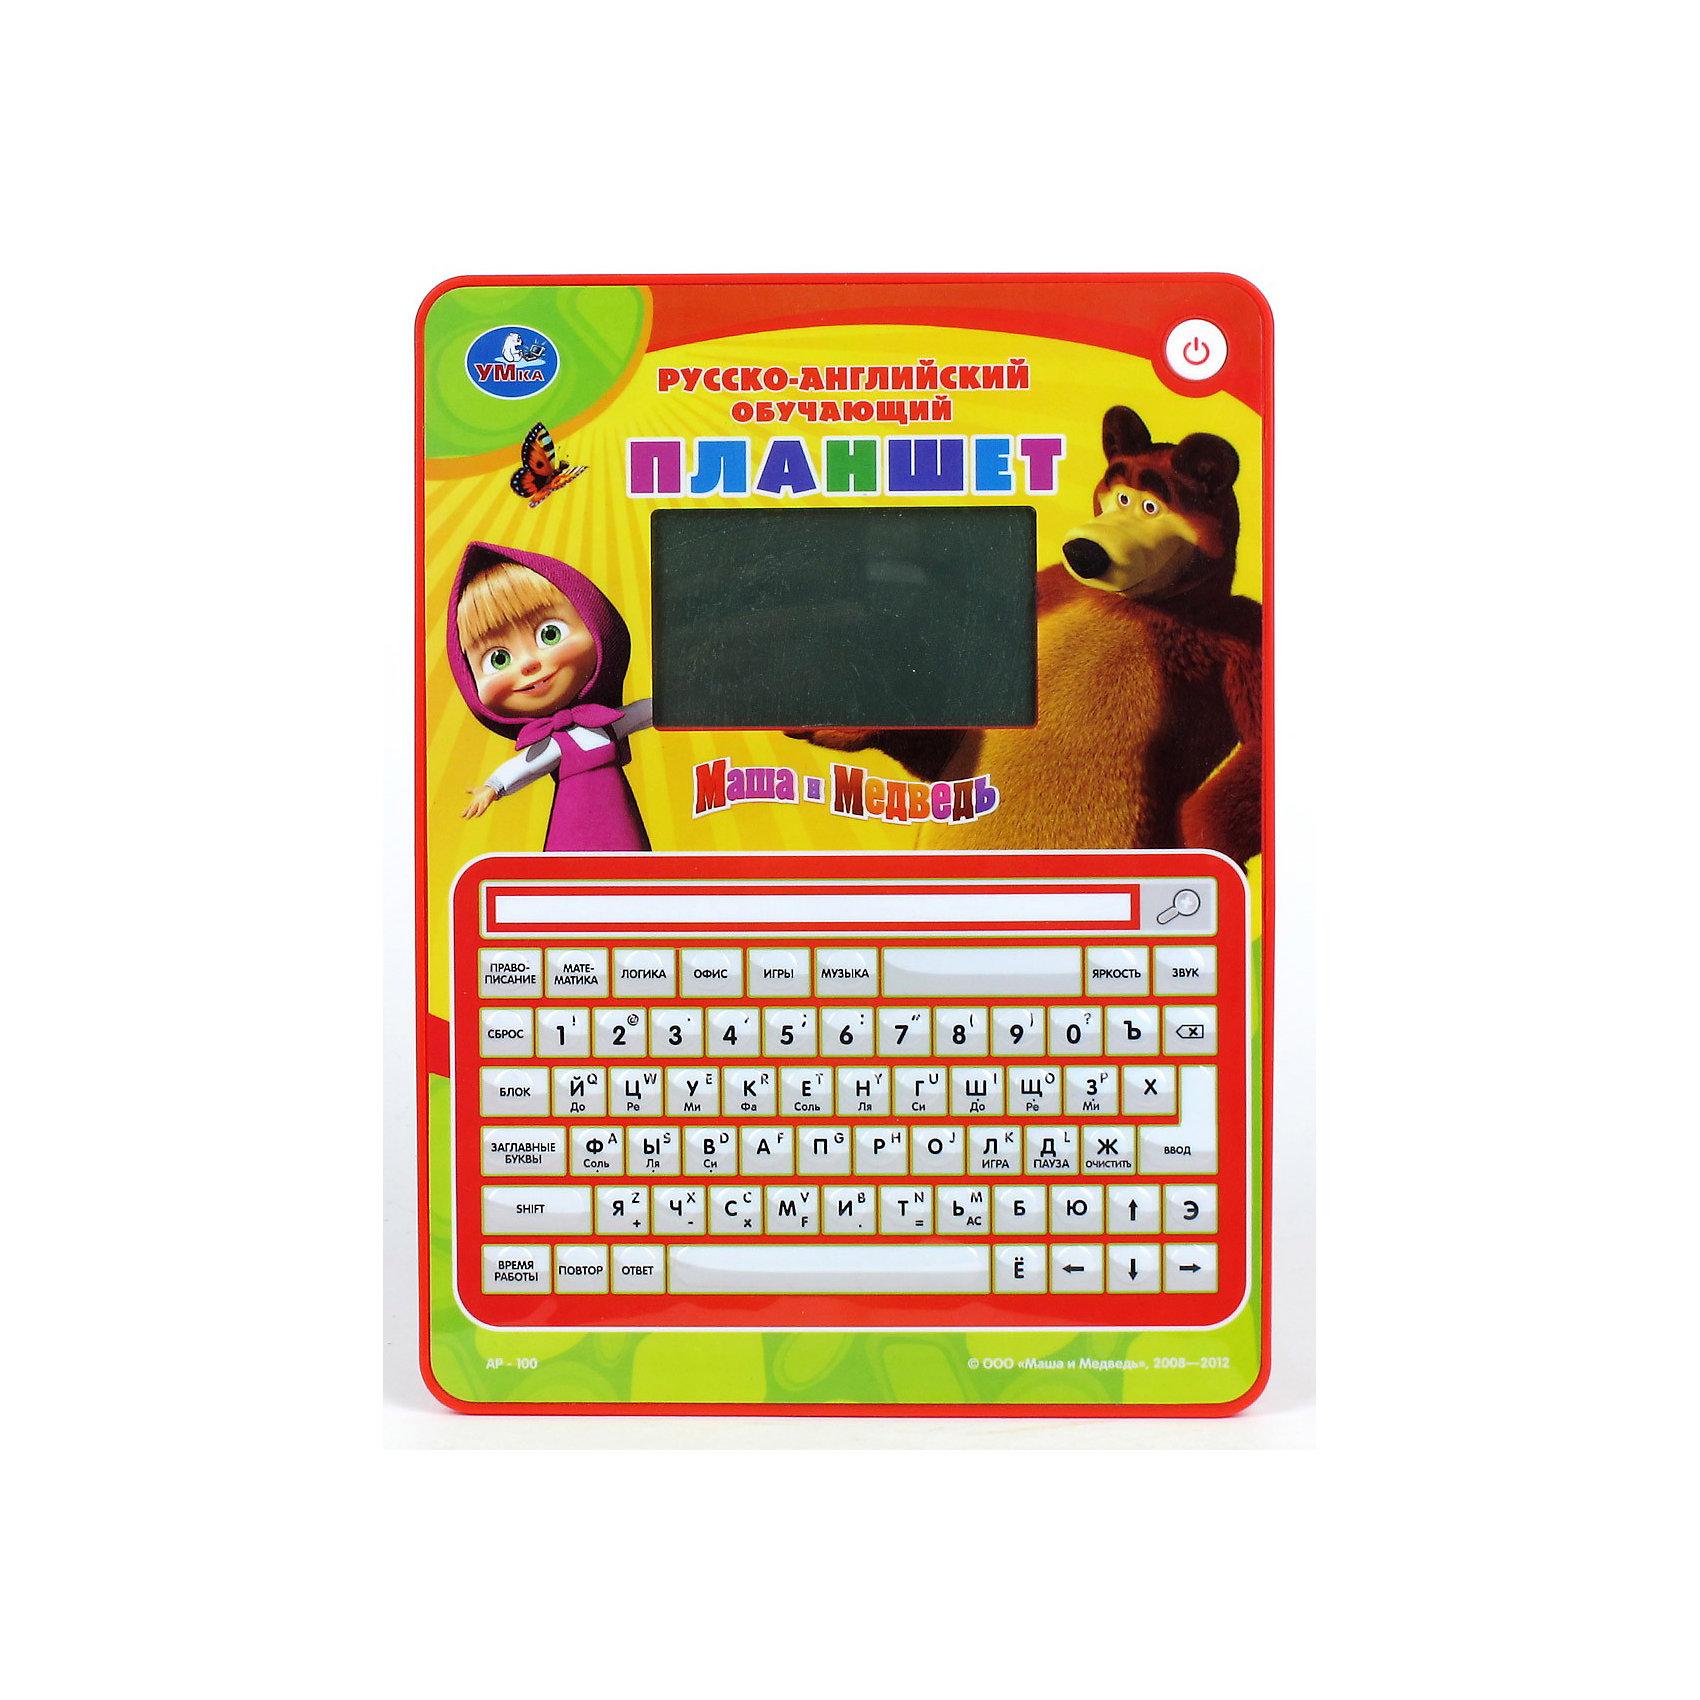 Умка Обучающий планшет Маша и медведь, 80 программ умка обучающий компьютер winx club 176 программ